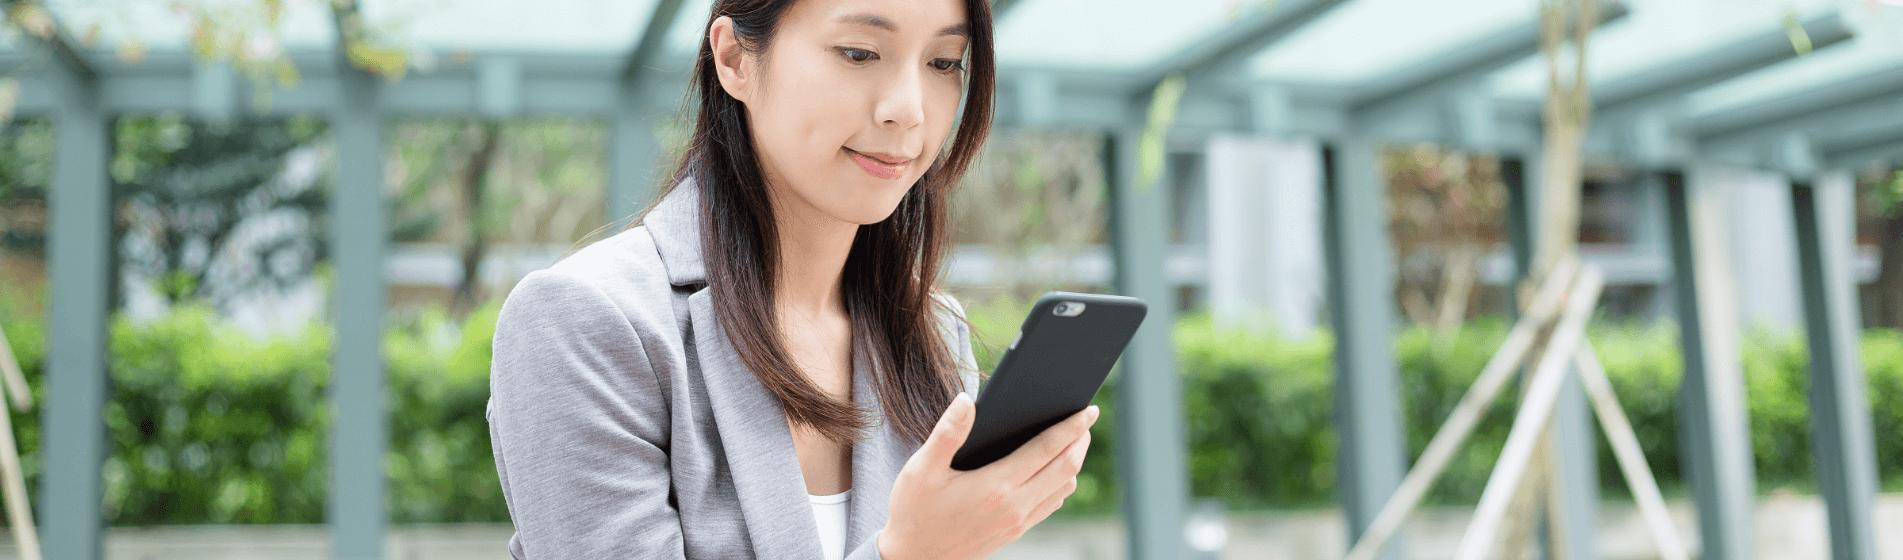 Entrepreneurs: is hiring virtual assistants overseas dead?